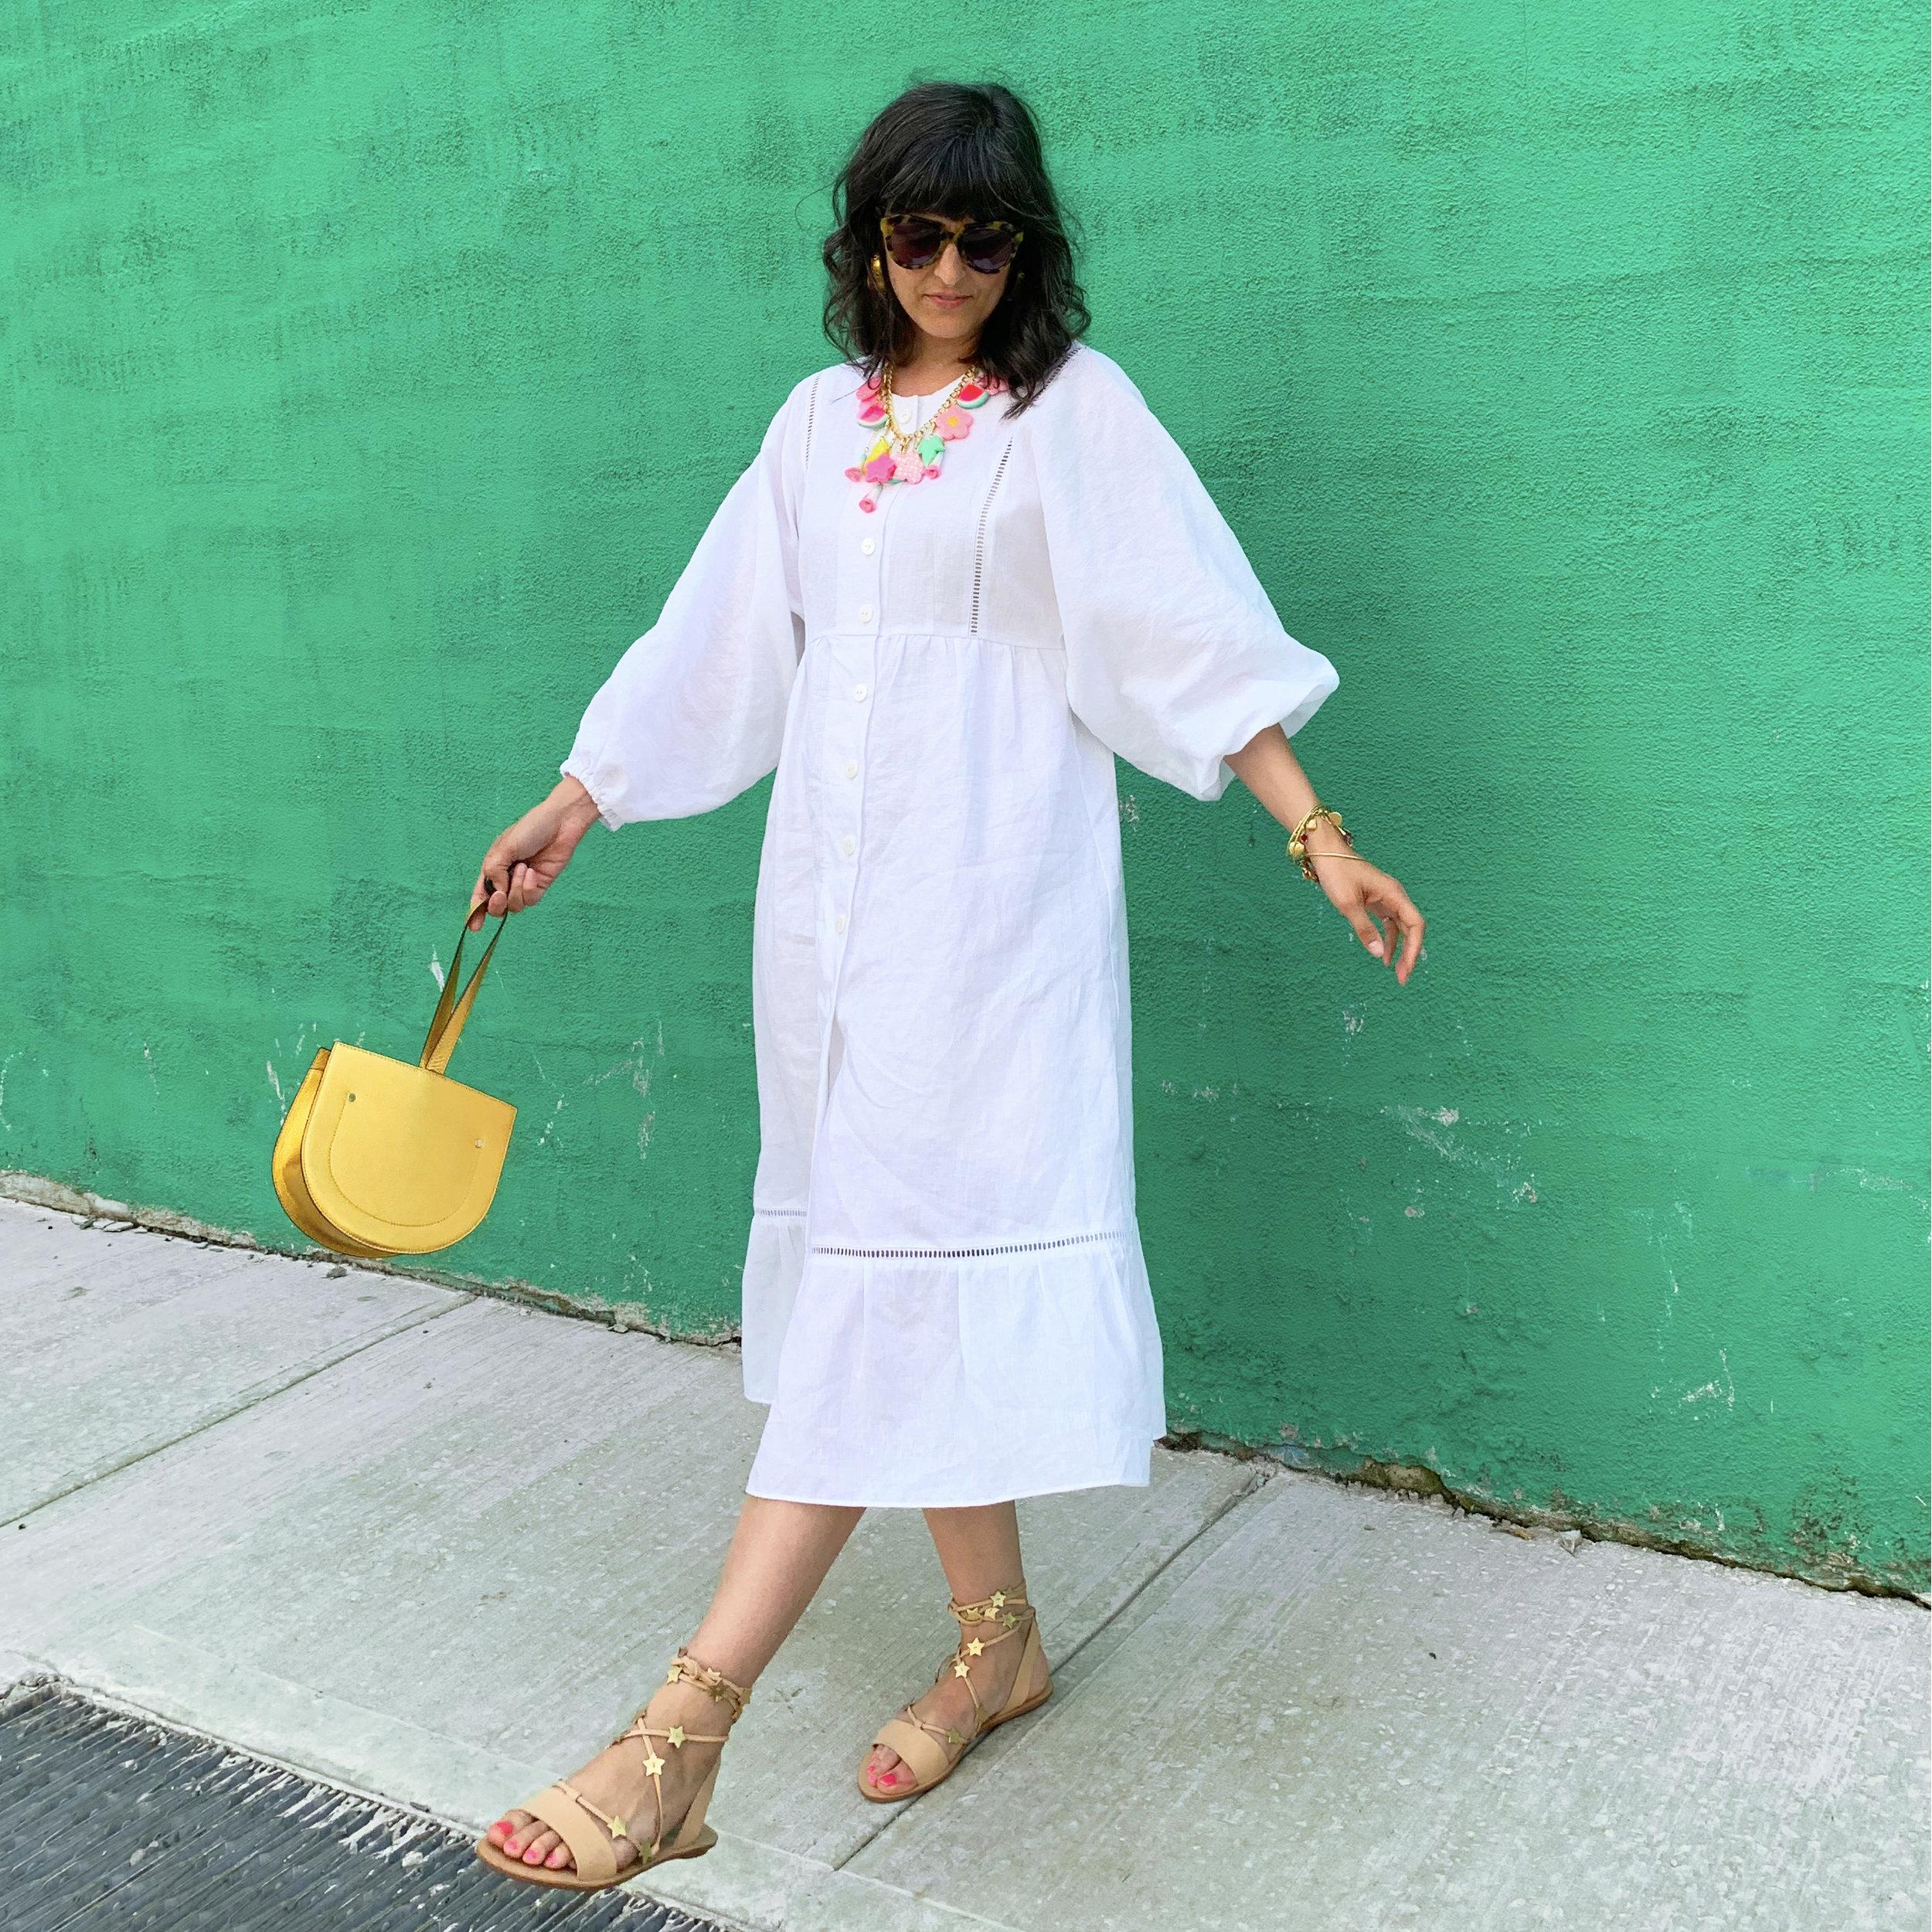 white dress swinging purse.jpg